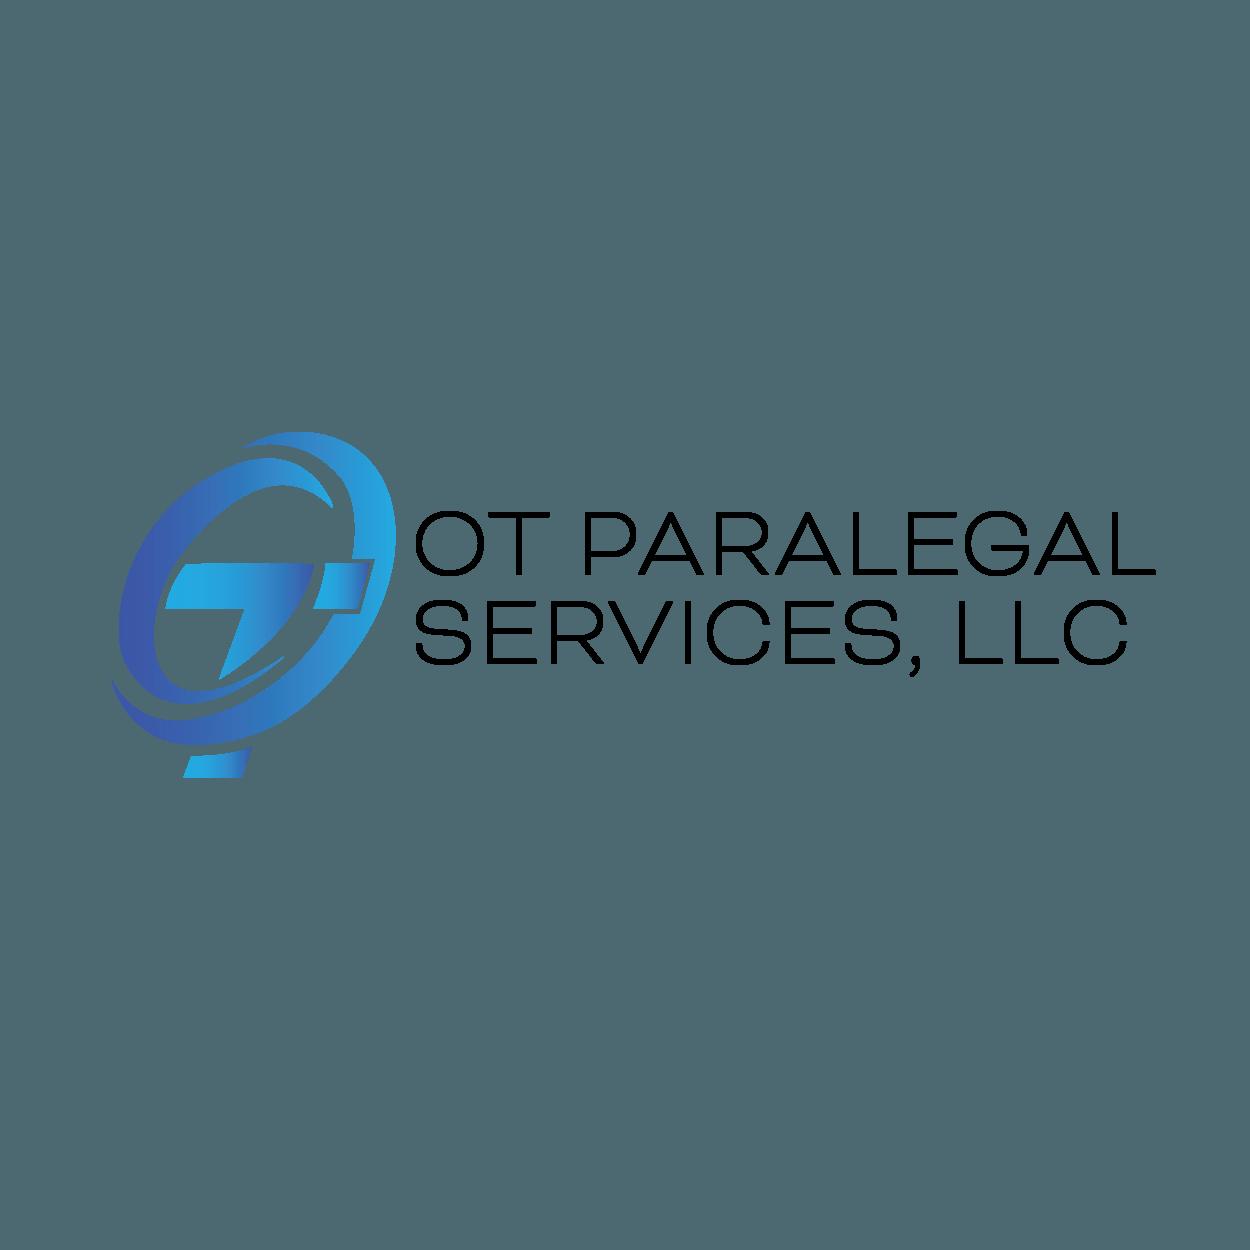 OT Paralegal Services